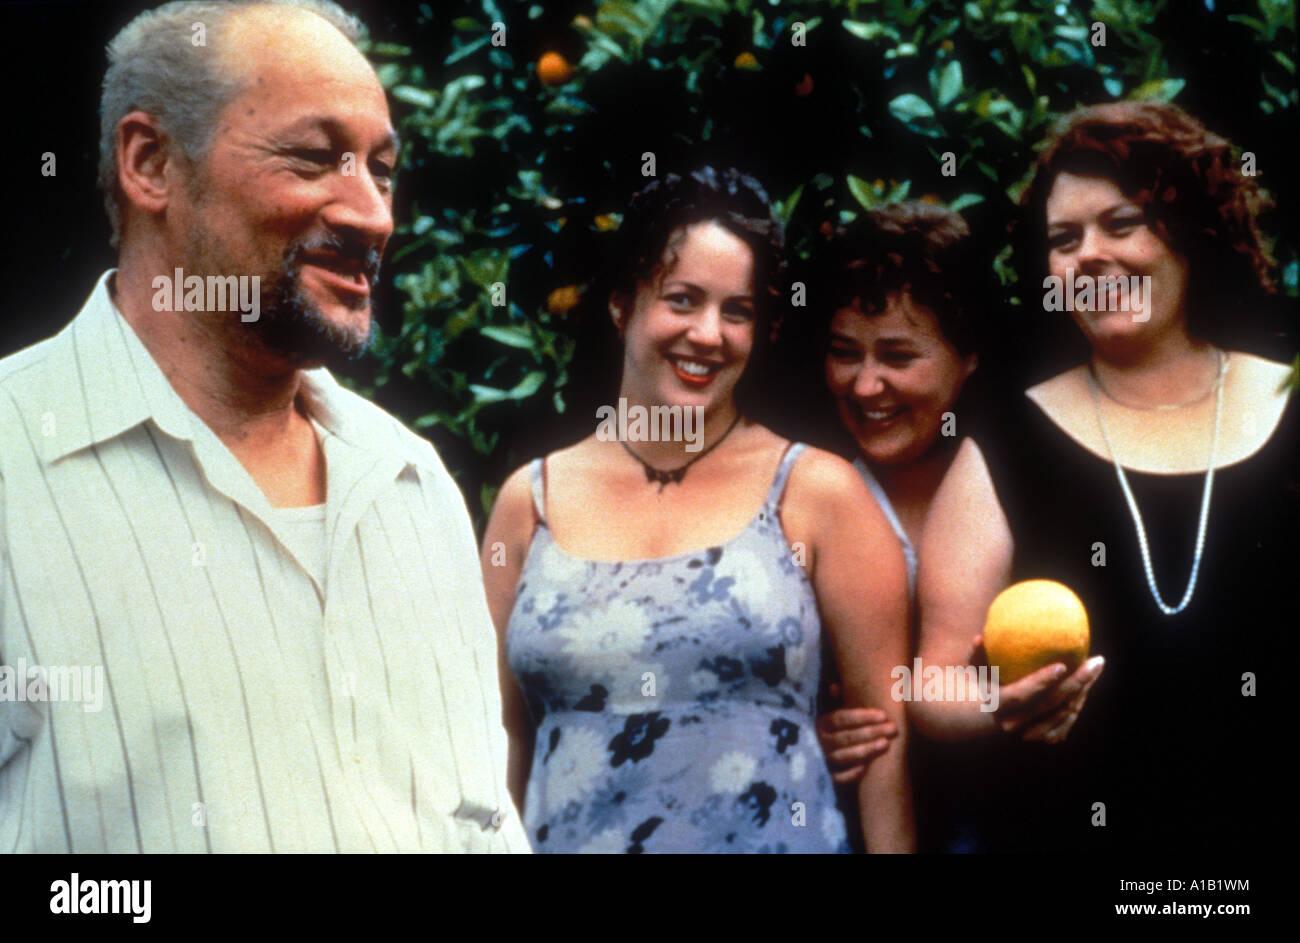 Briga Heelan,Kat Coiro Adult pic Demi Harman,Judy Prescott